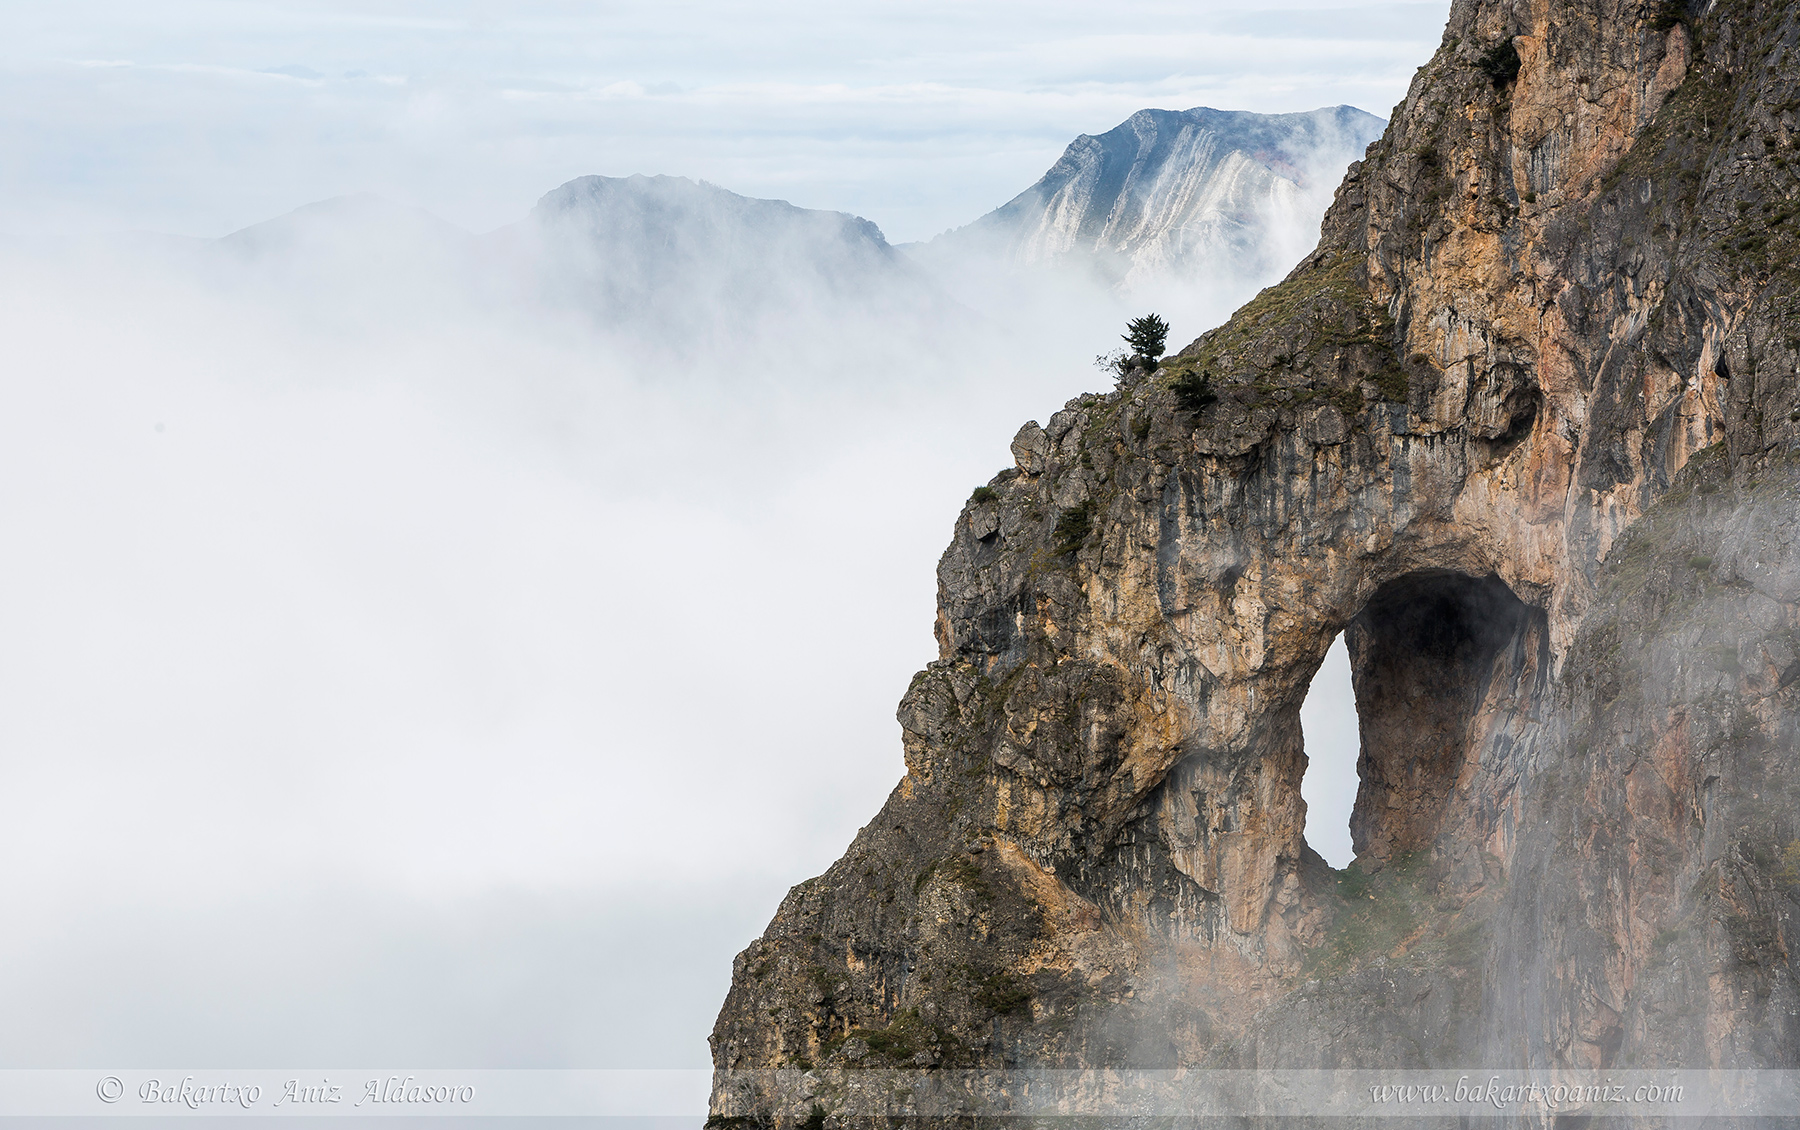 Detalle de Castiellu - Somiedo - Tierra de teitos y bosques - Bakartxo Aniz - Fotografías de Asturias. Somiedo - Muniellos.